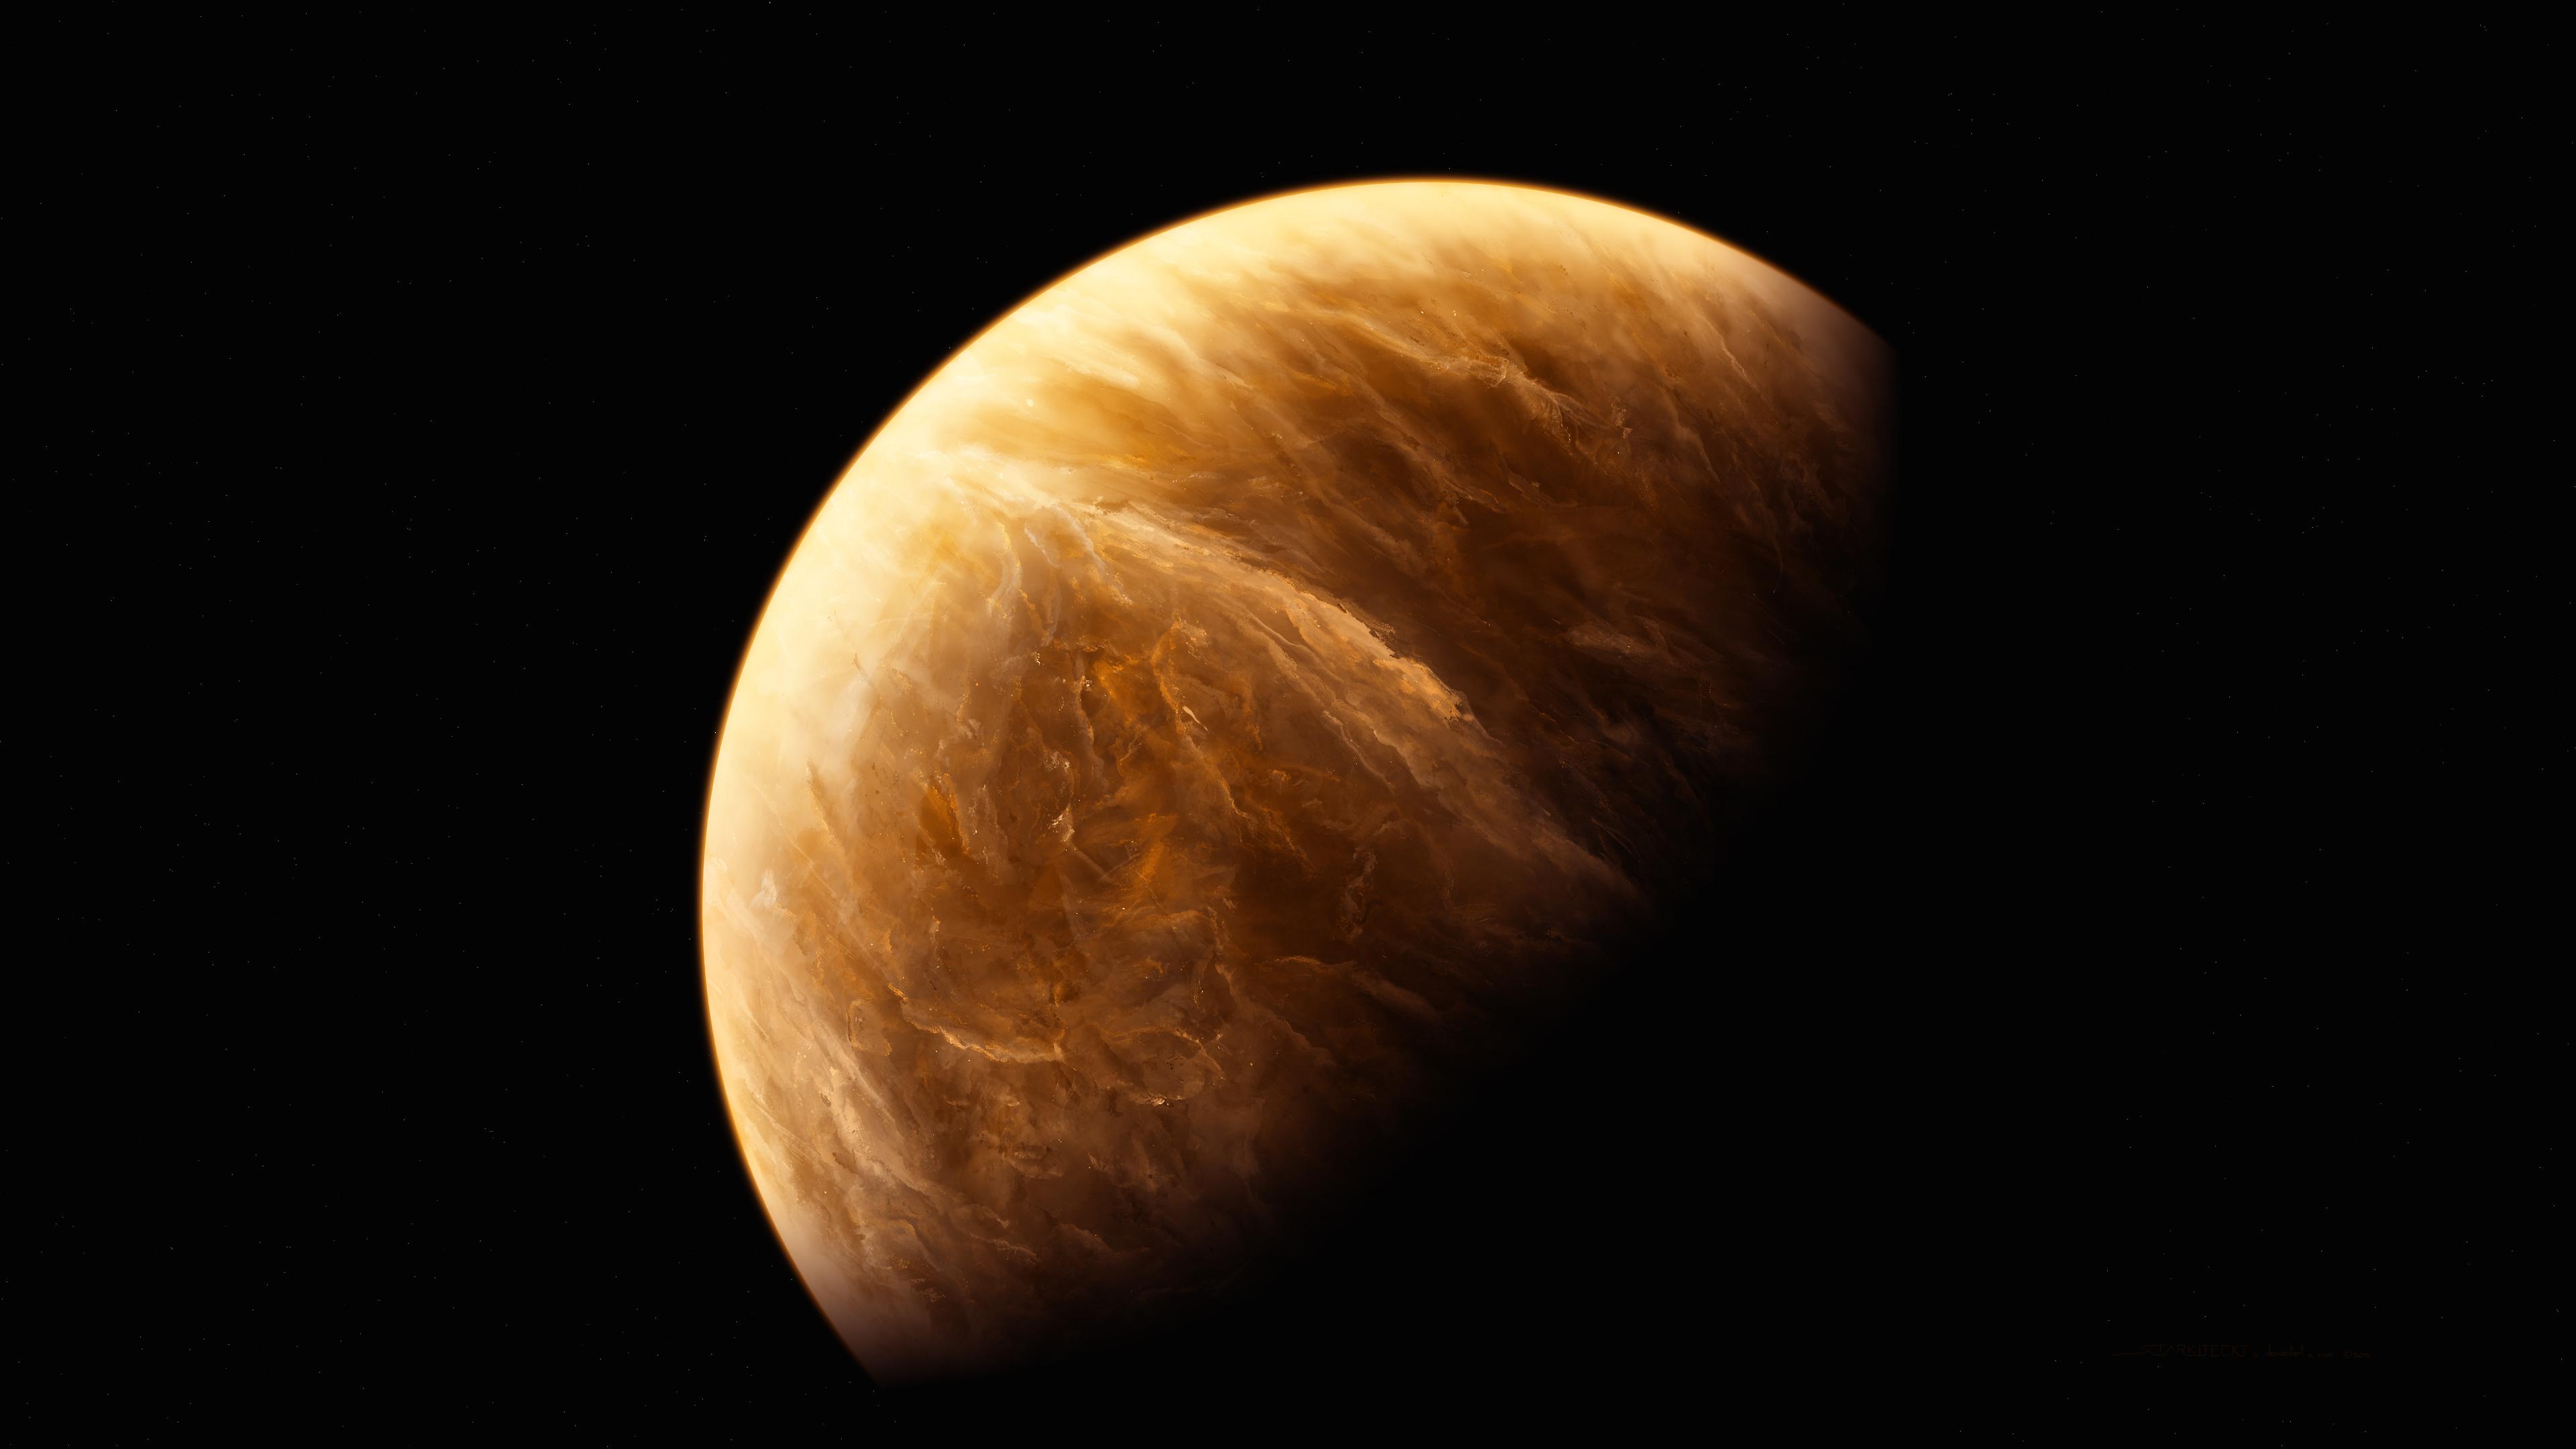 orange planet 4k 1546279226 - Orange Planet 4k - planet wallpapers, hd-wallpapers, digital universe wallpapers, 5k wallpapers, 4k-wallpapers